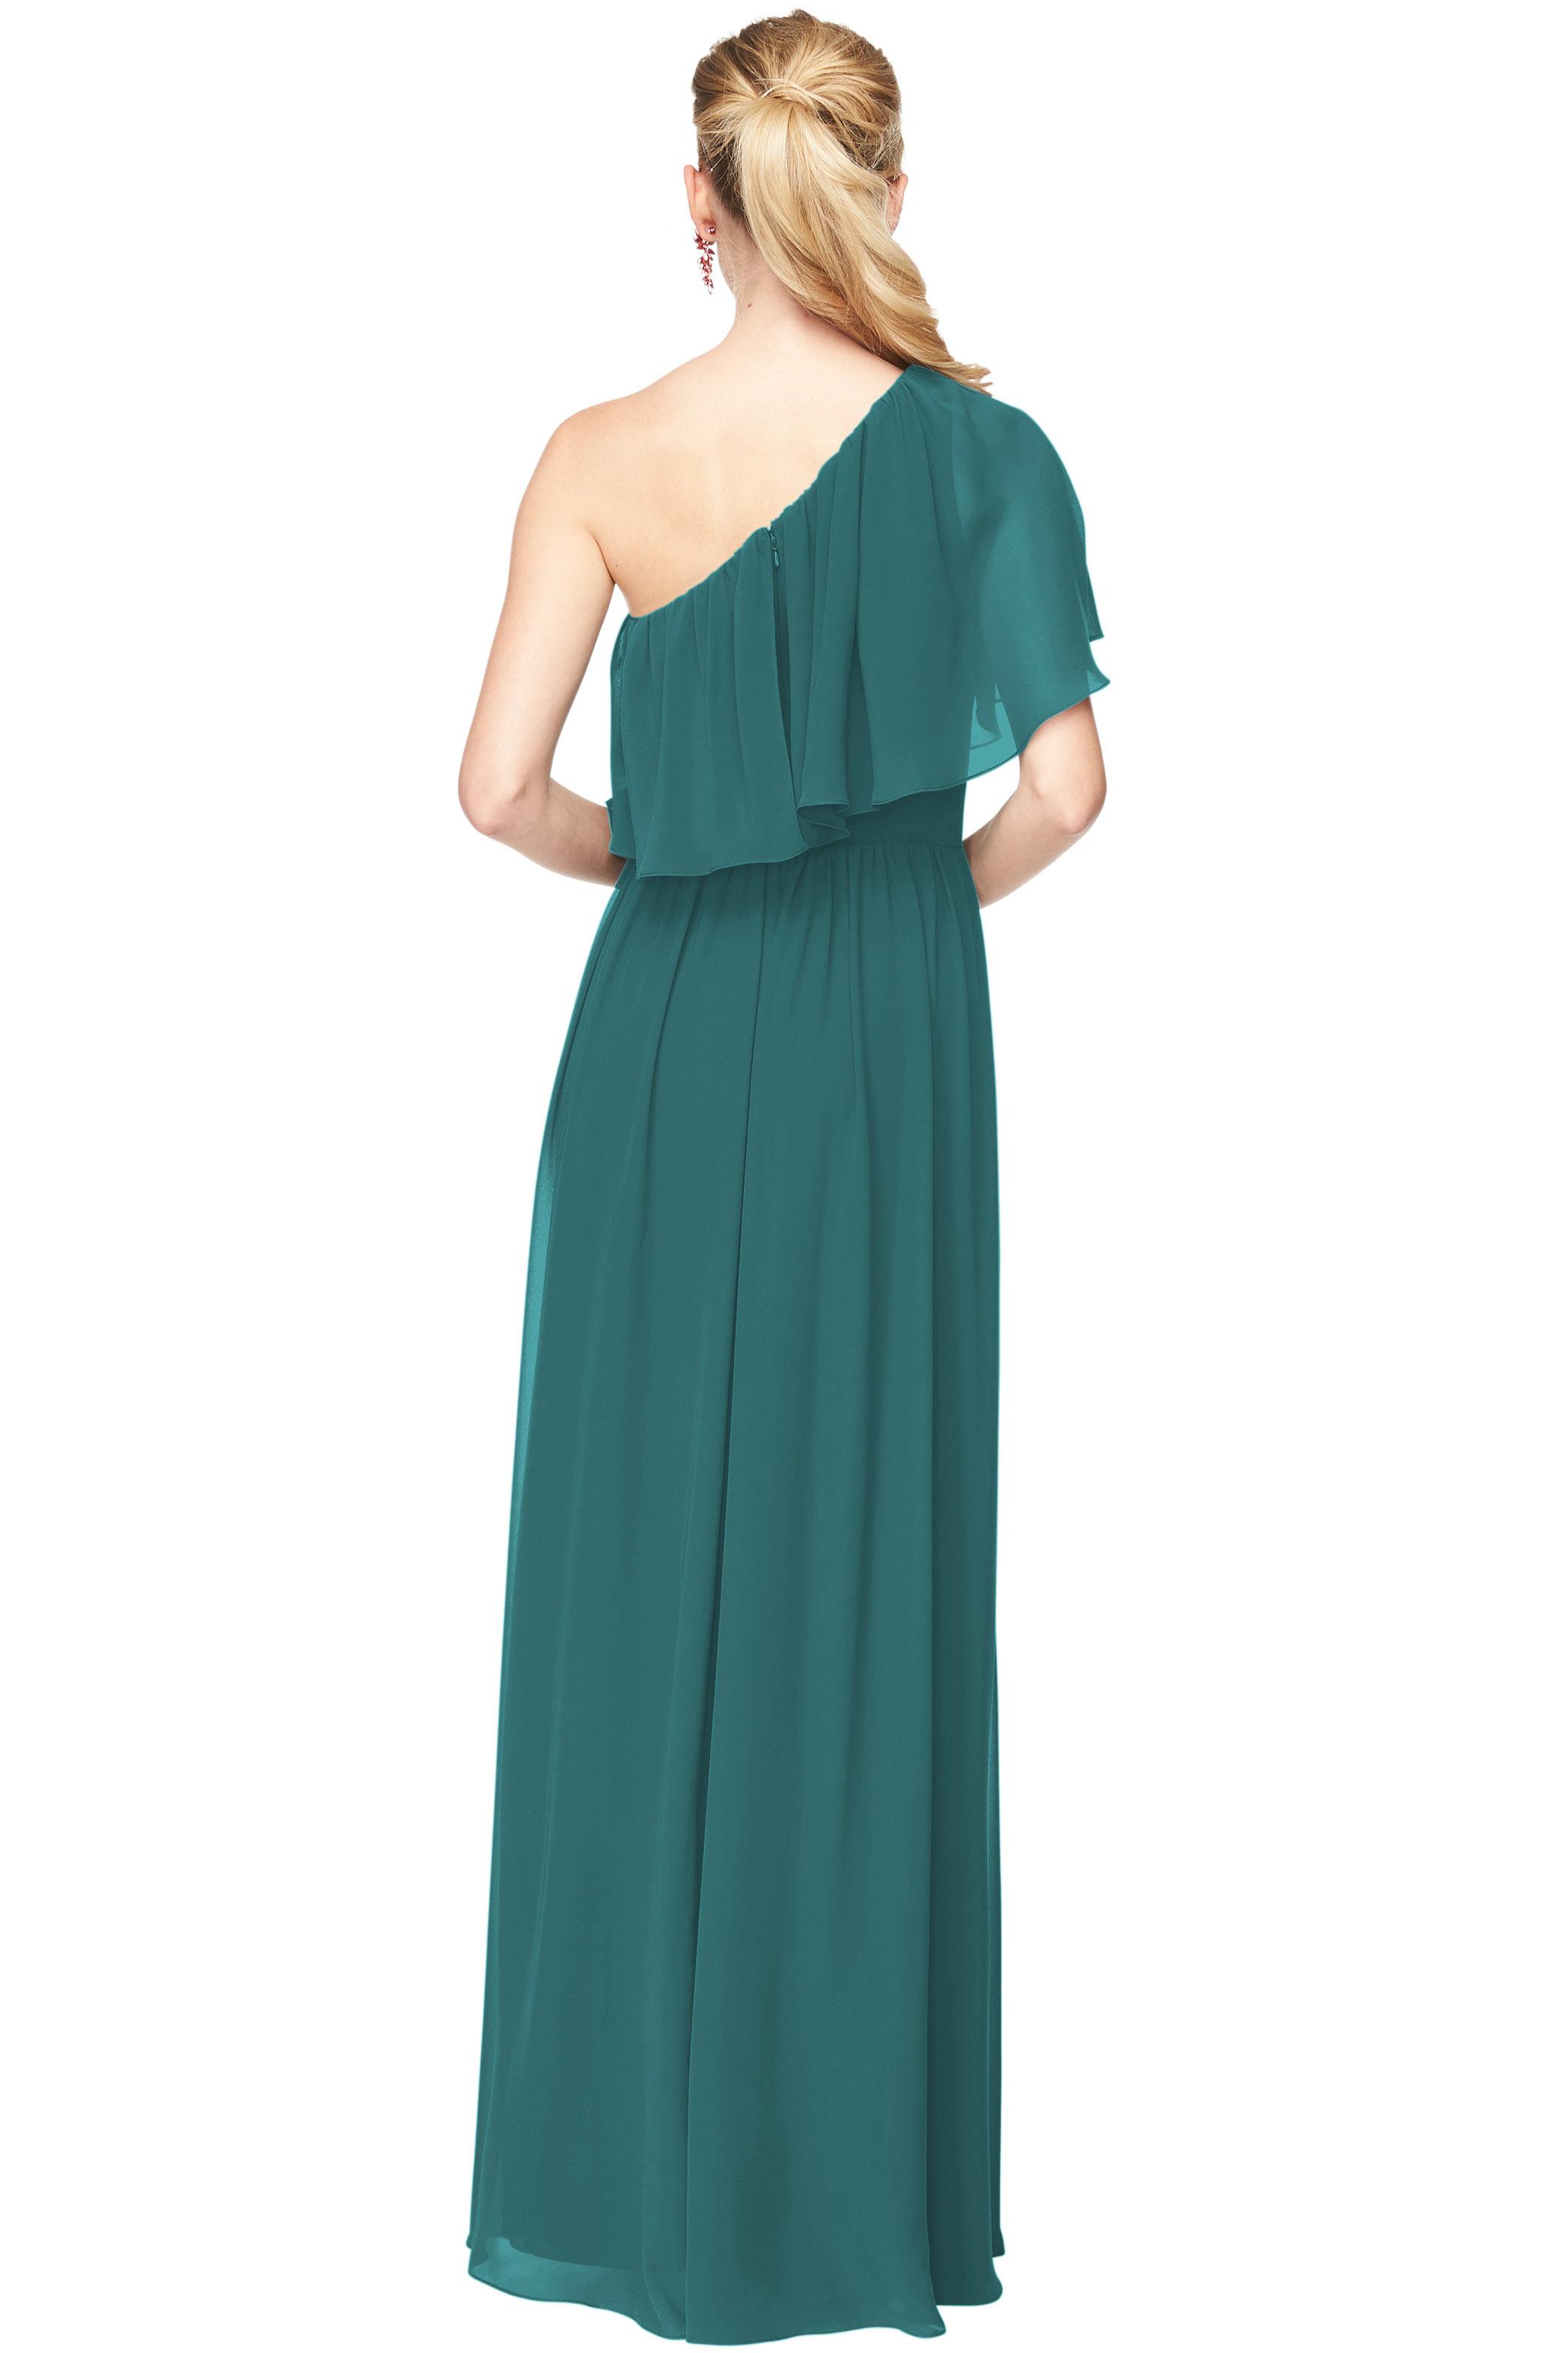 Bill Levkoff OASIS Chiffon One-Shoulder A-Line gown, $156.40 Back